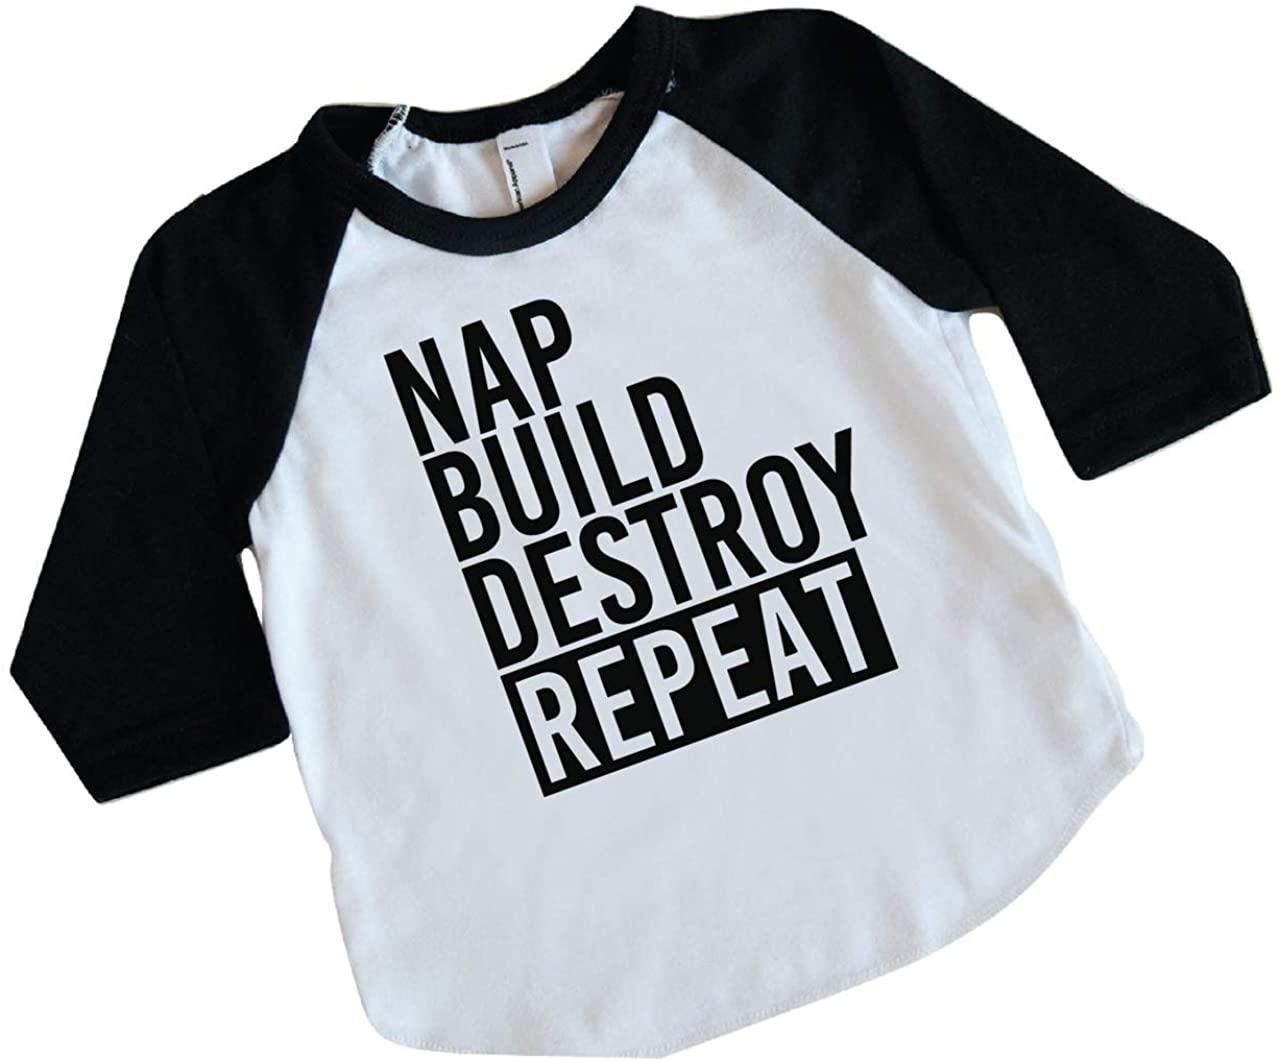 Funny Toddler Boy Shirt Nap Build Destroy Repeat Raglan